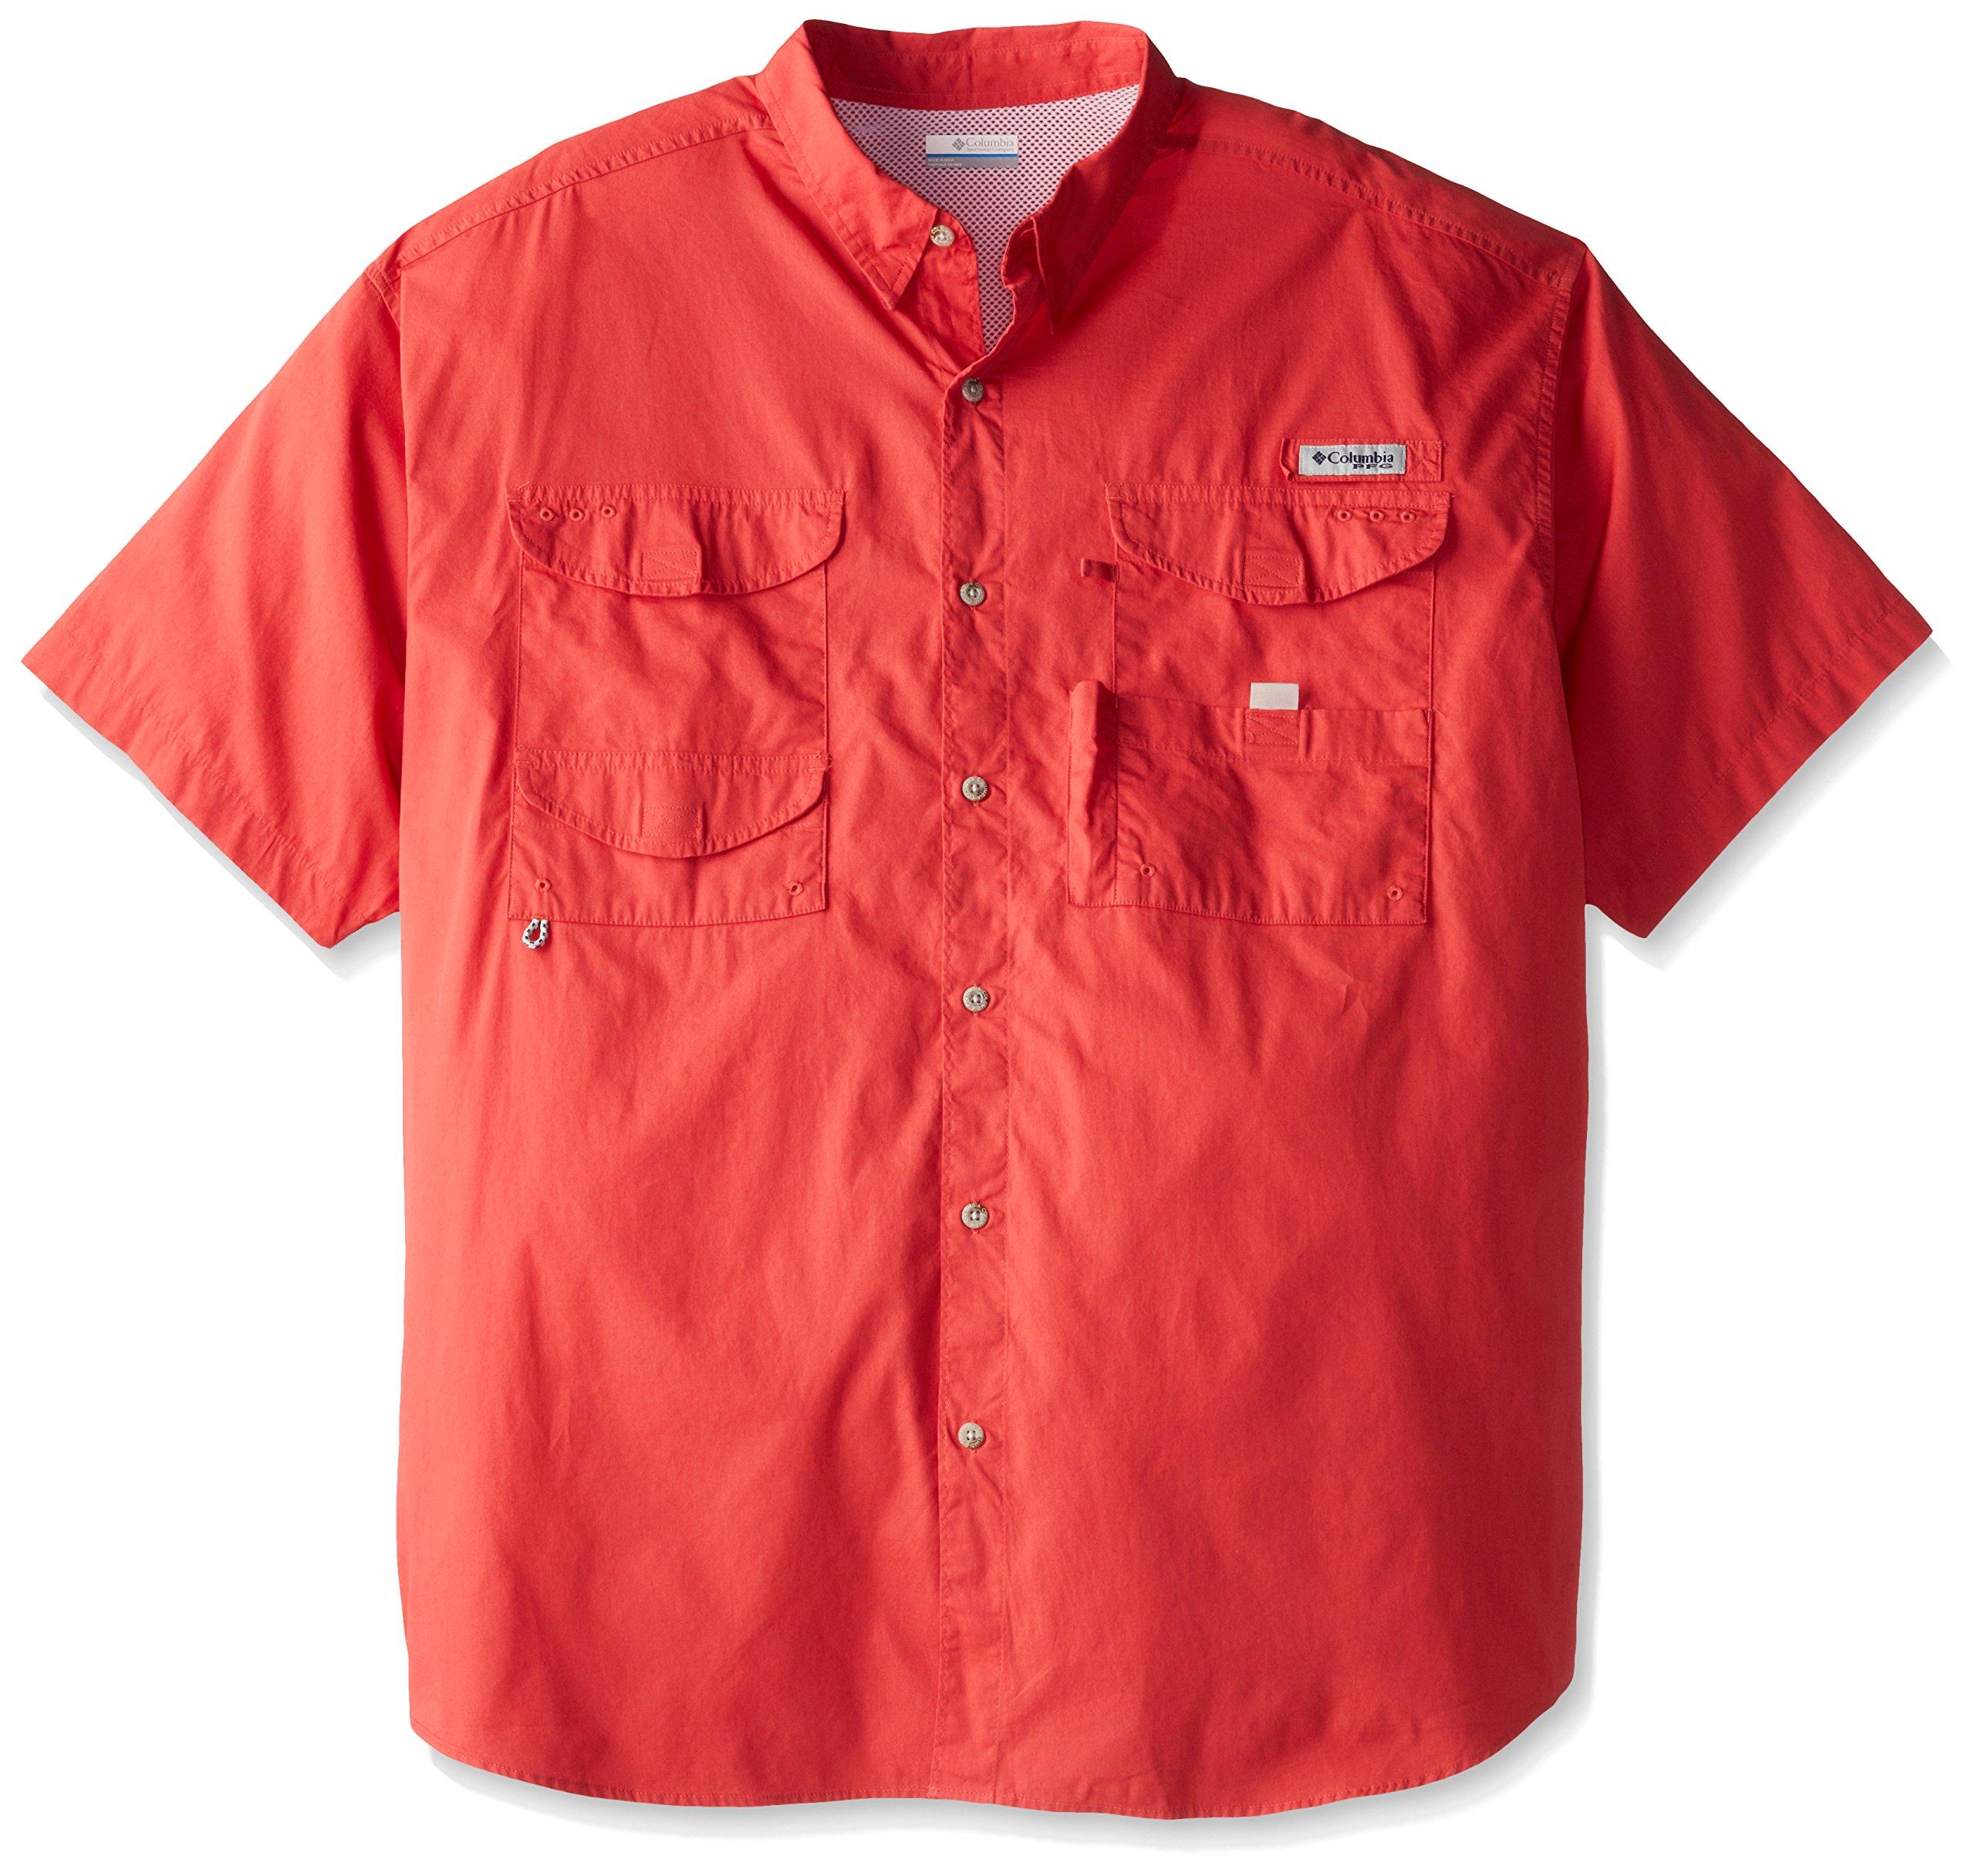 Columbia Men's Bonehead Short Sleeve Shirt, Sunset Red, Large by Columbia